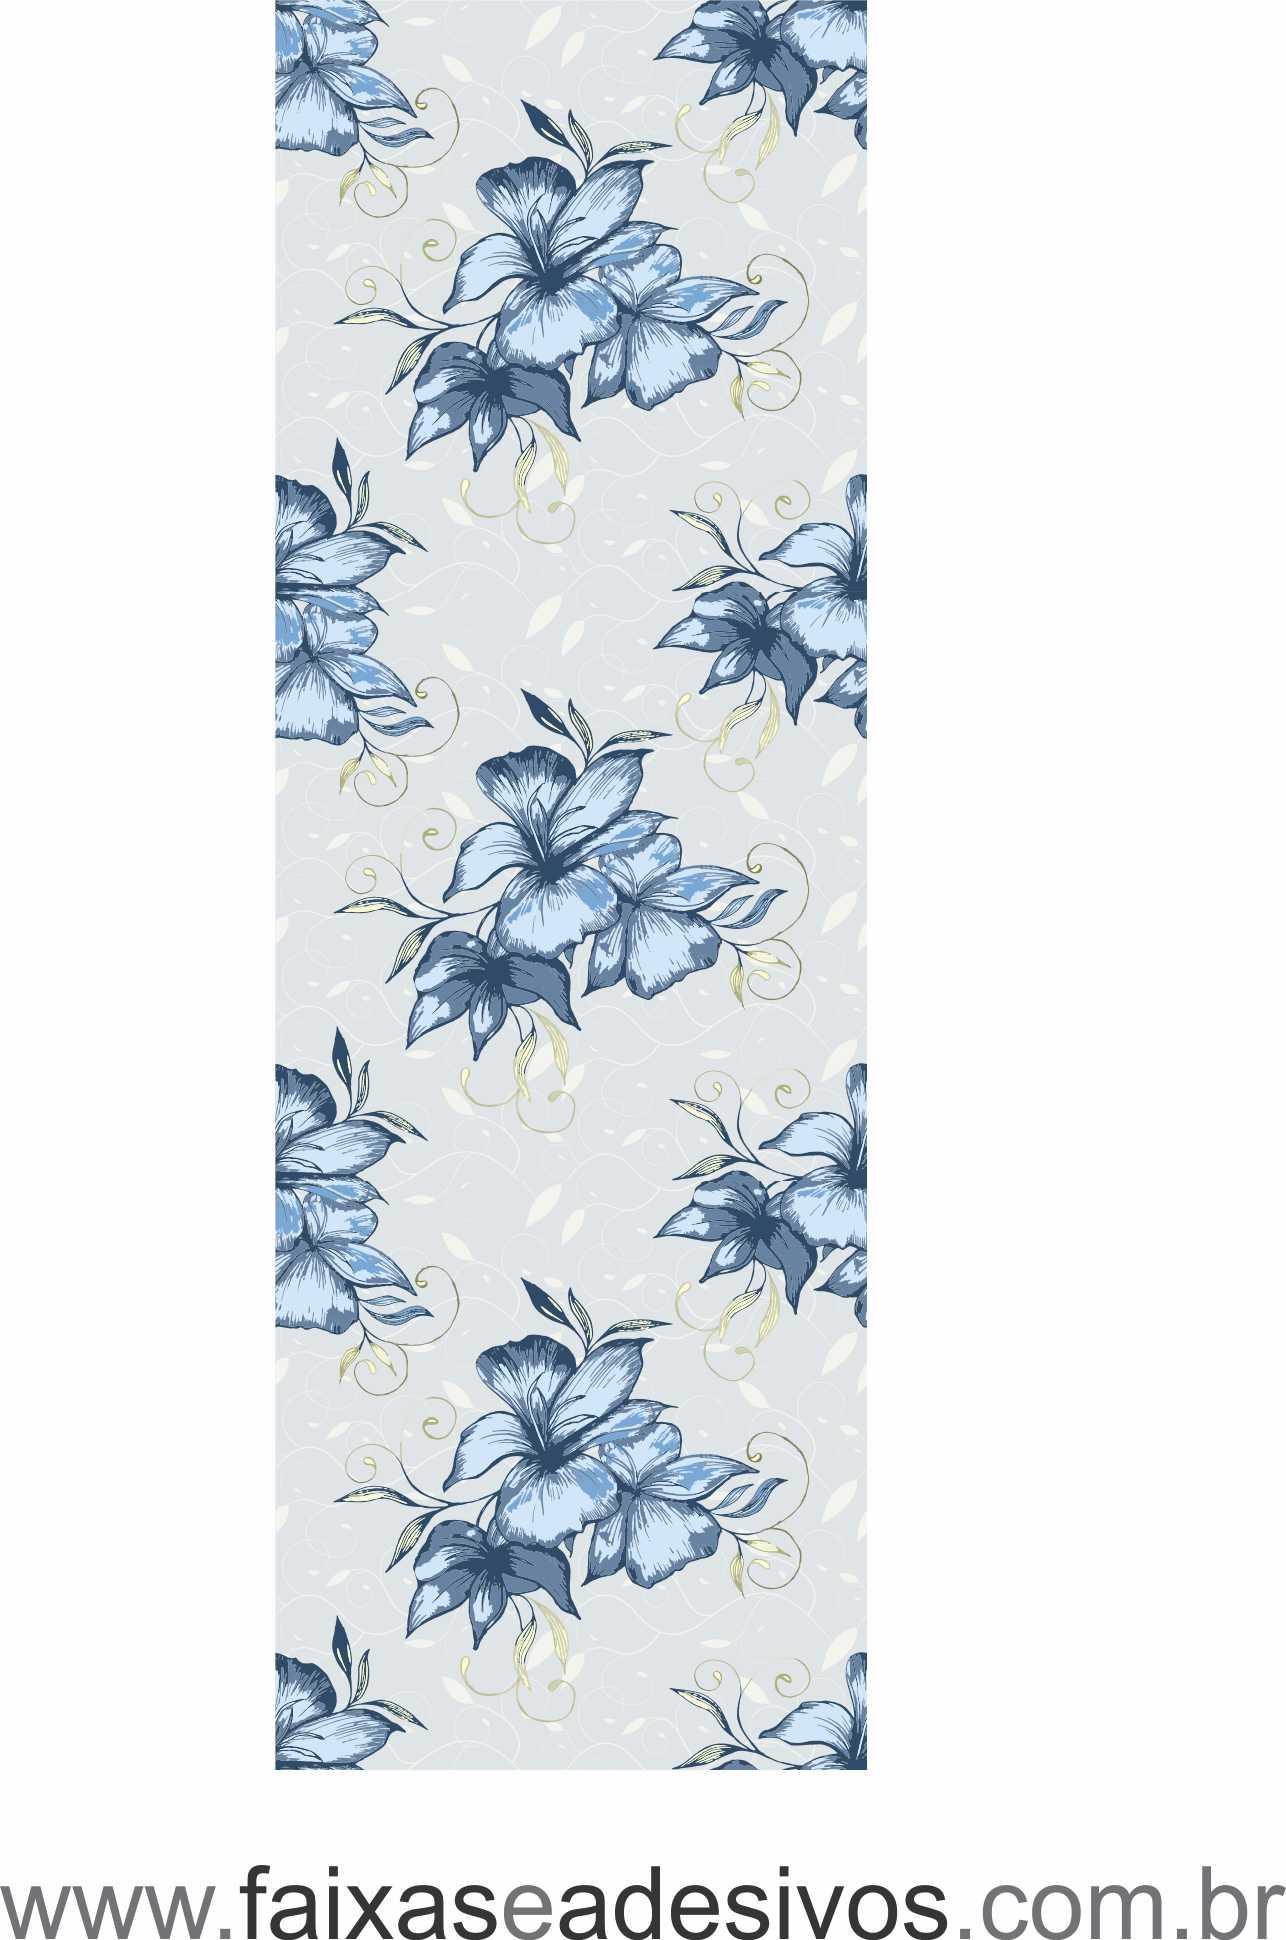 075 VD - Adesivo Jateado para vidro Floral Blue 220x70cm  - FAC Signs Impressão Digital